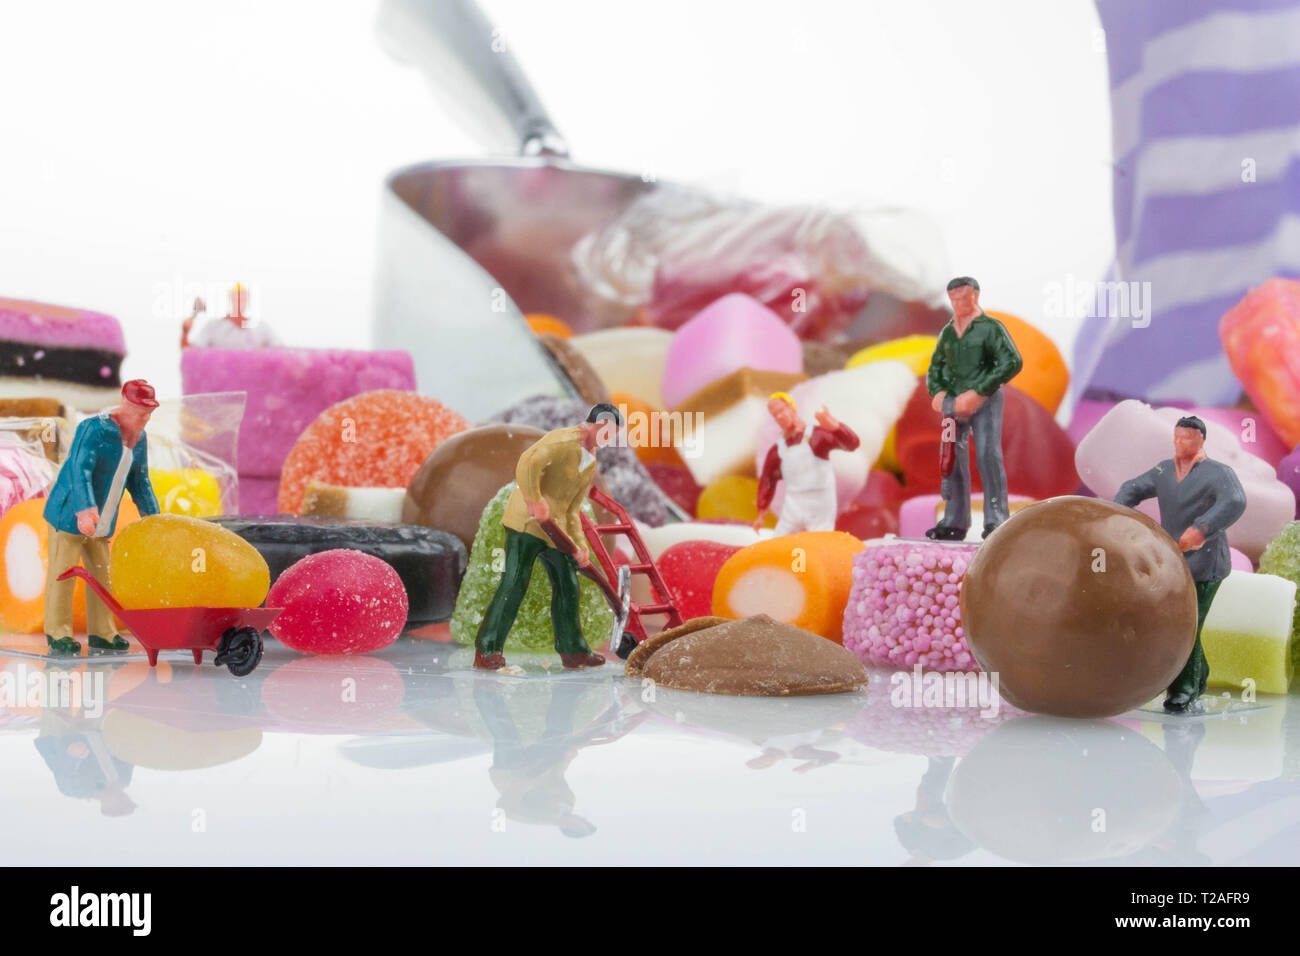 Miniature people - Sweet selection - Stock Image